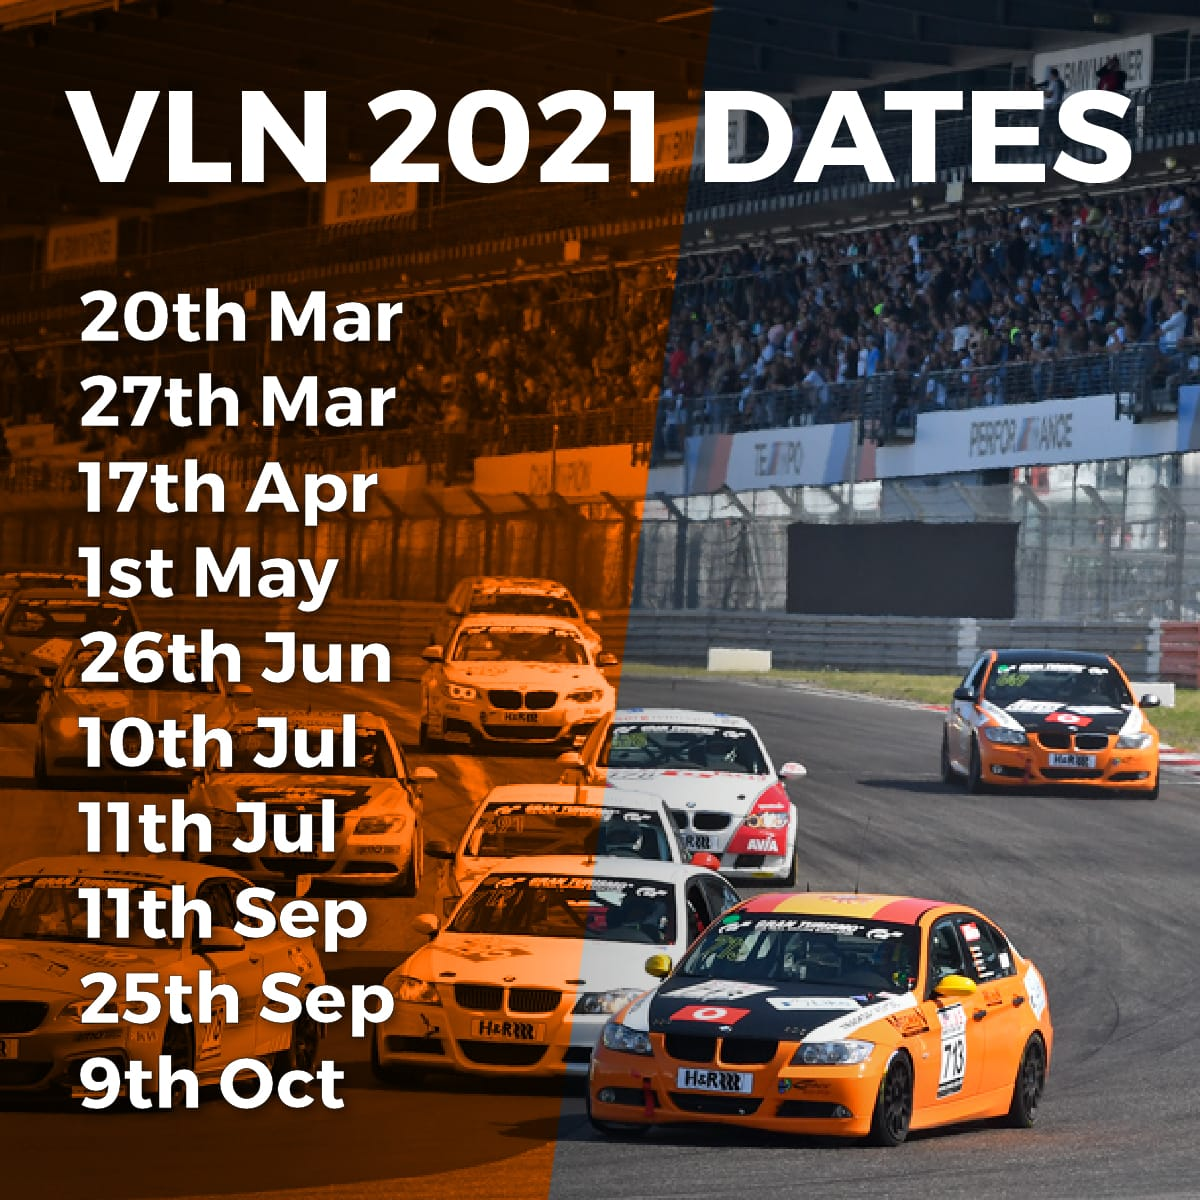 VLN-dates